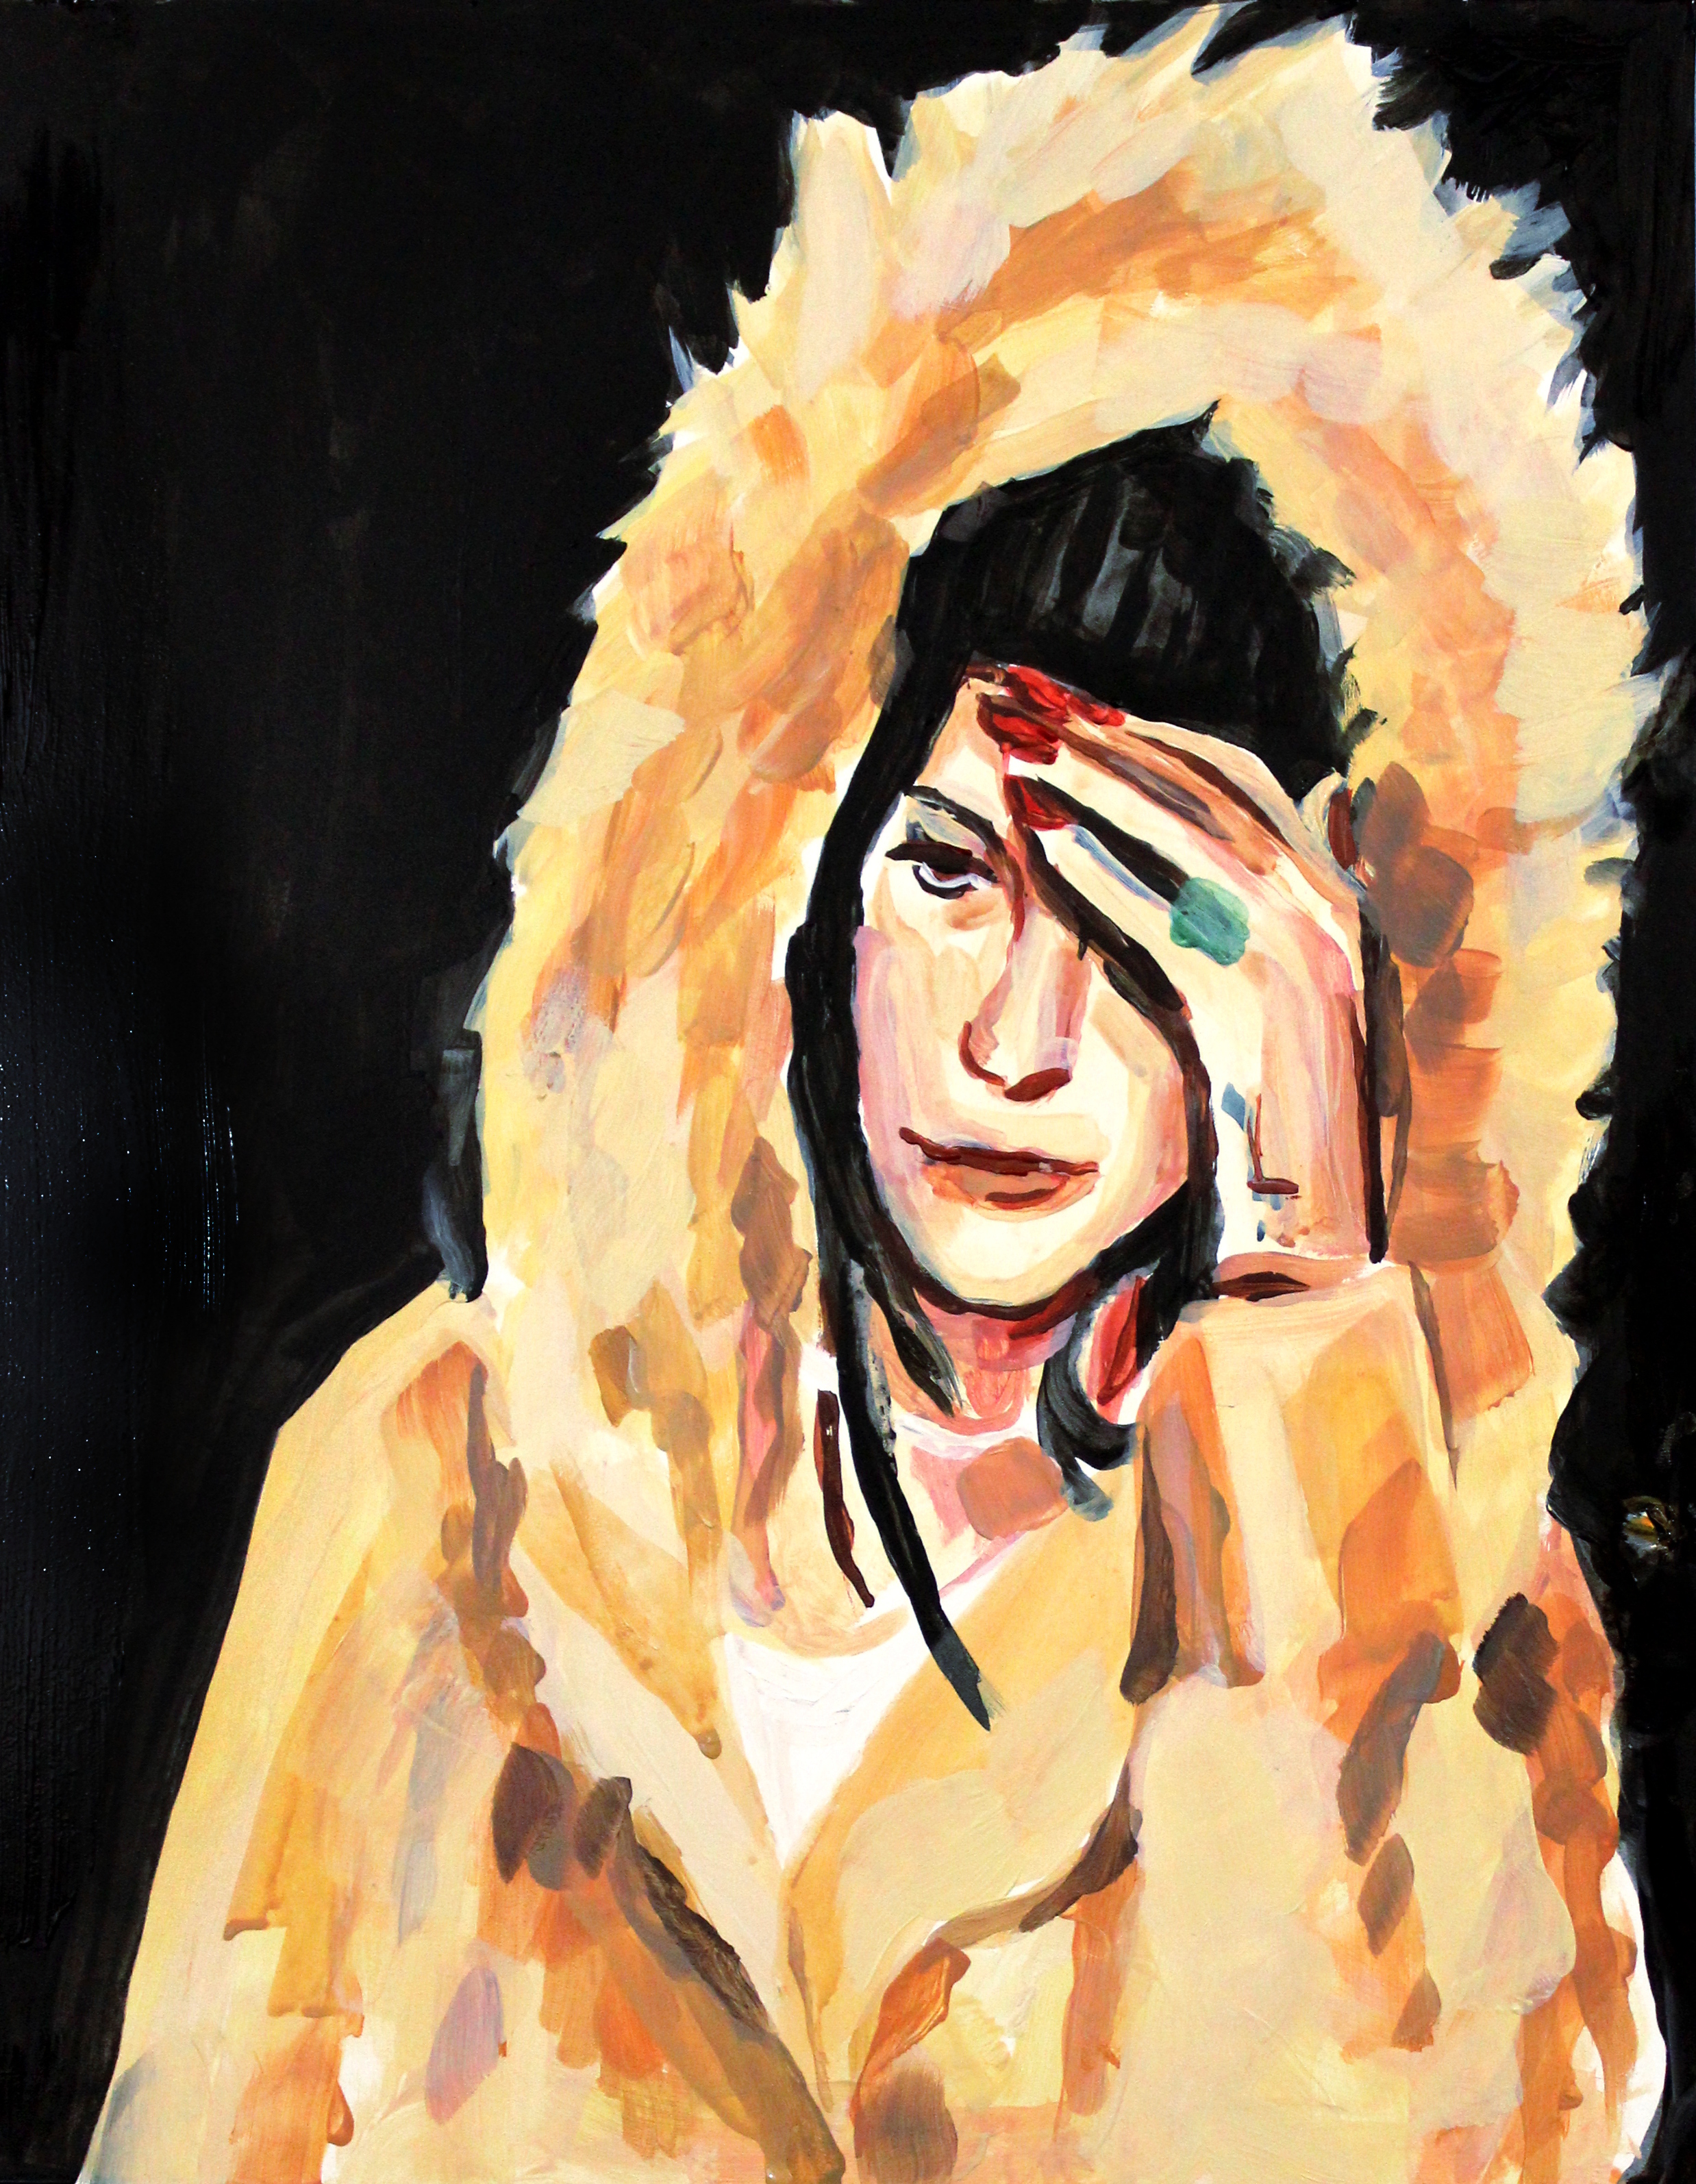 "Lana Del Rey in a Fur Hood    12"" x 16"" acrylic on panel"